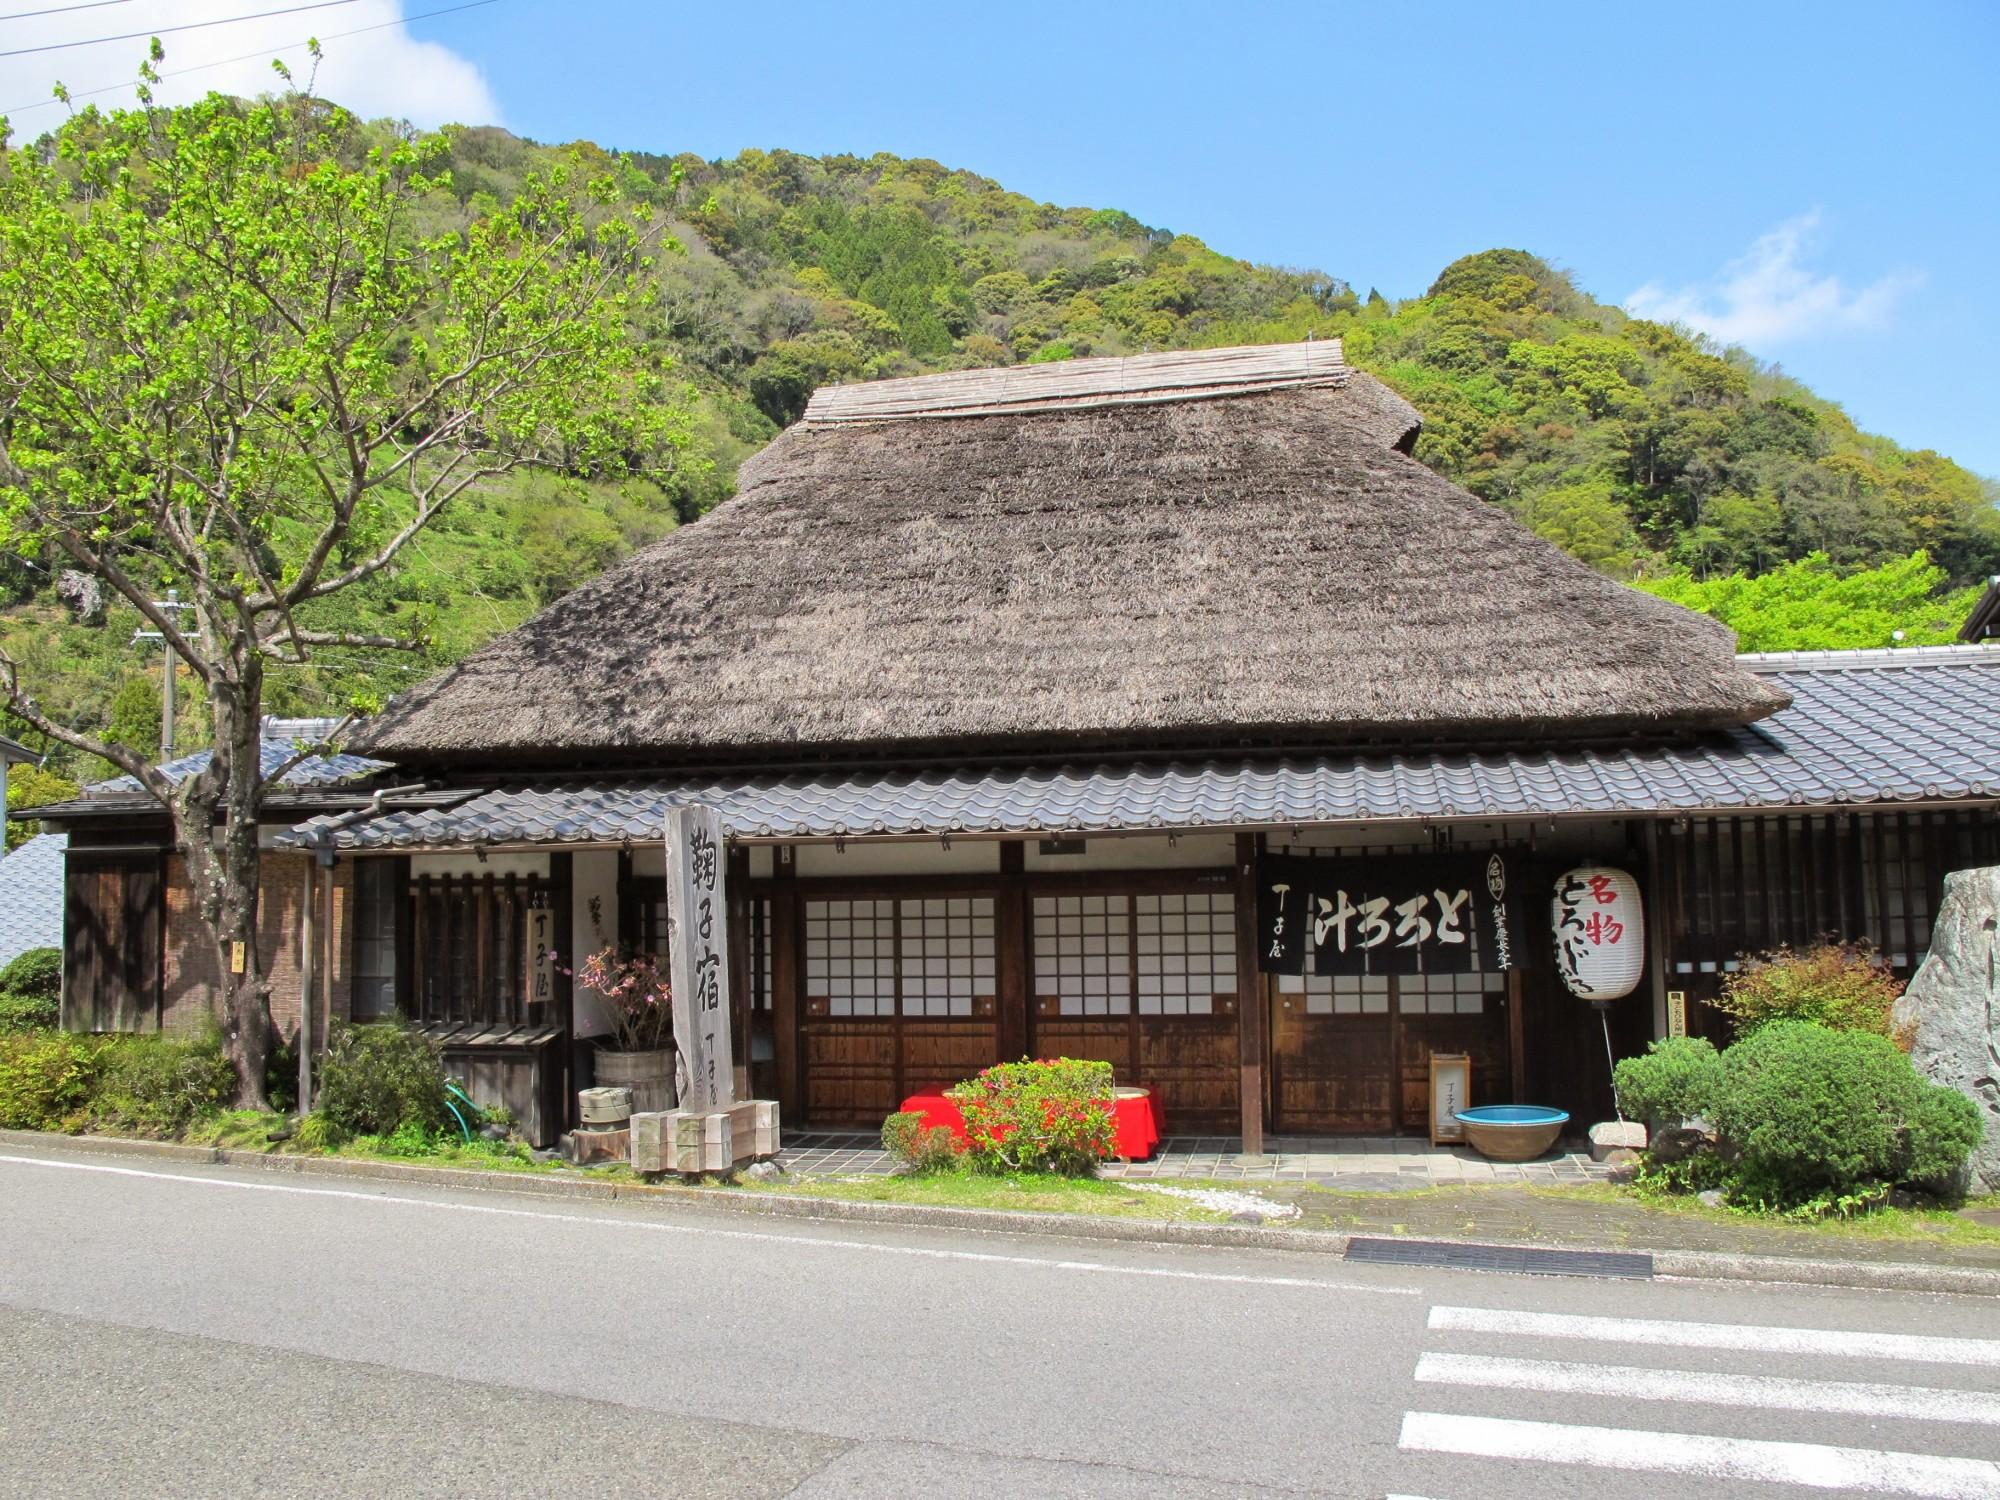 Tokaido_Trail_Chojiya_inn_01.JPG